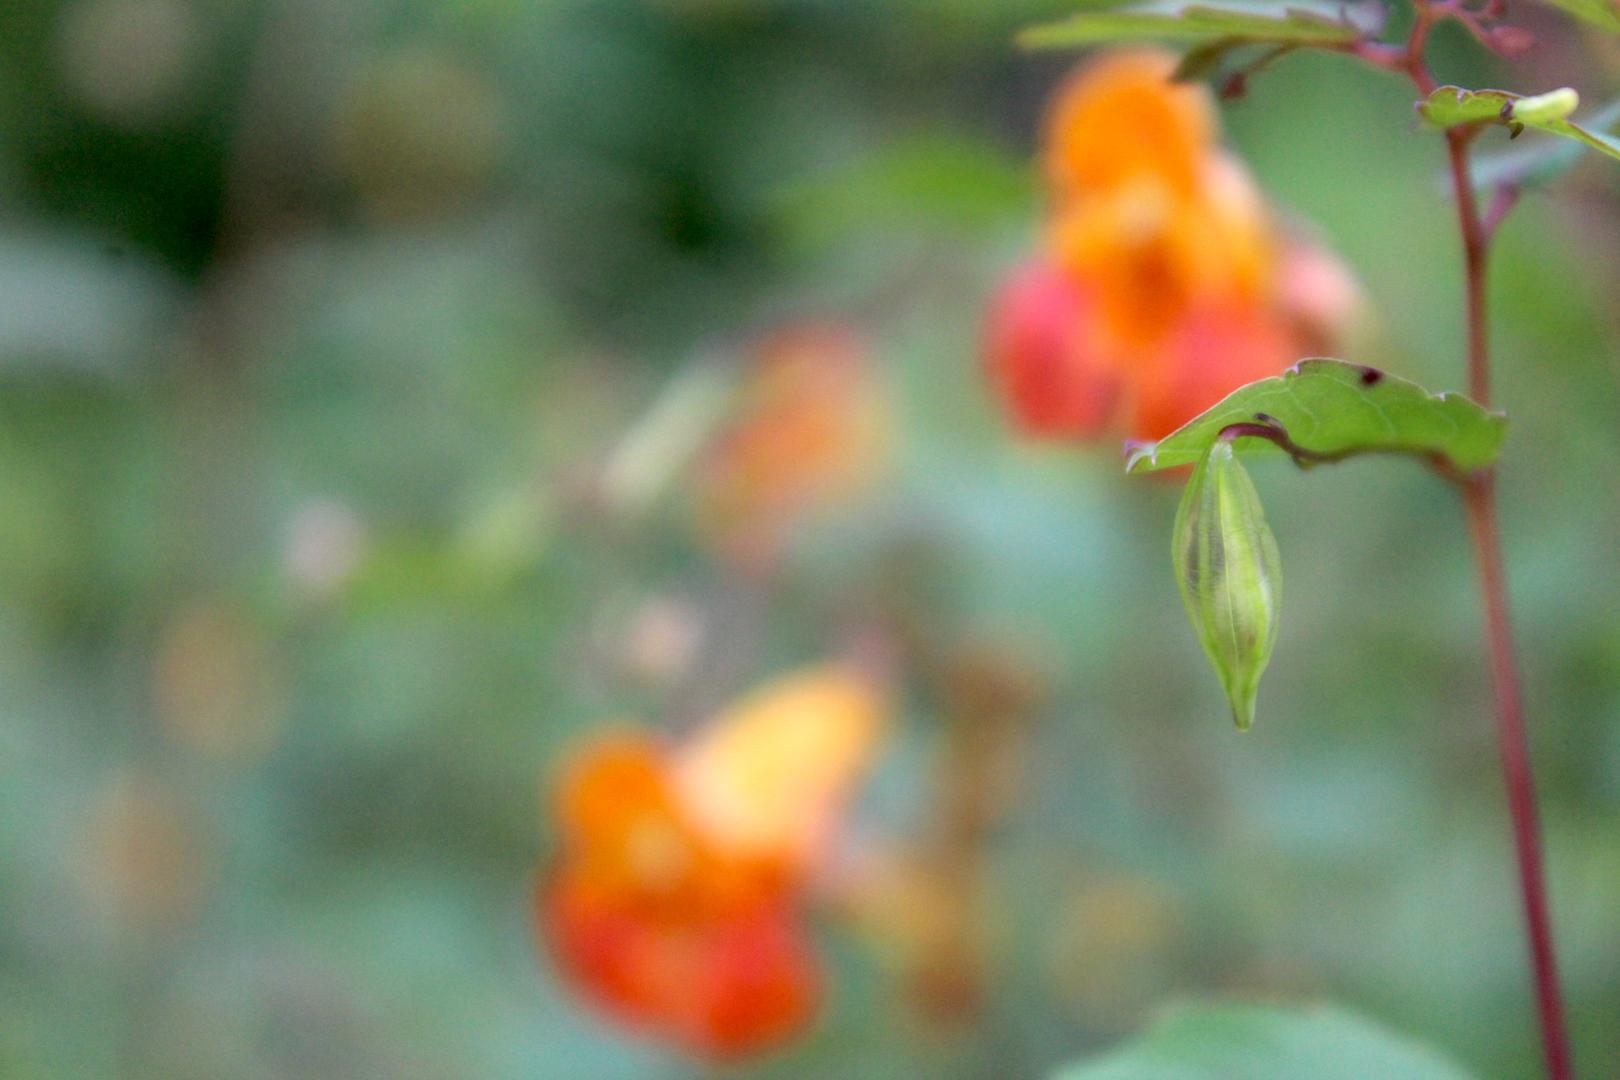 Jewelweed Seed Pod on Plant